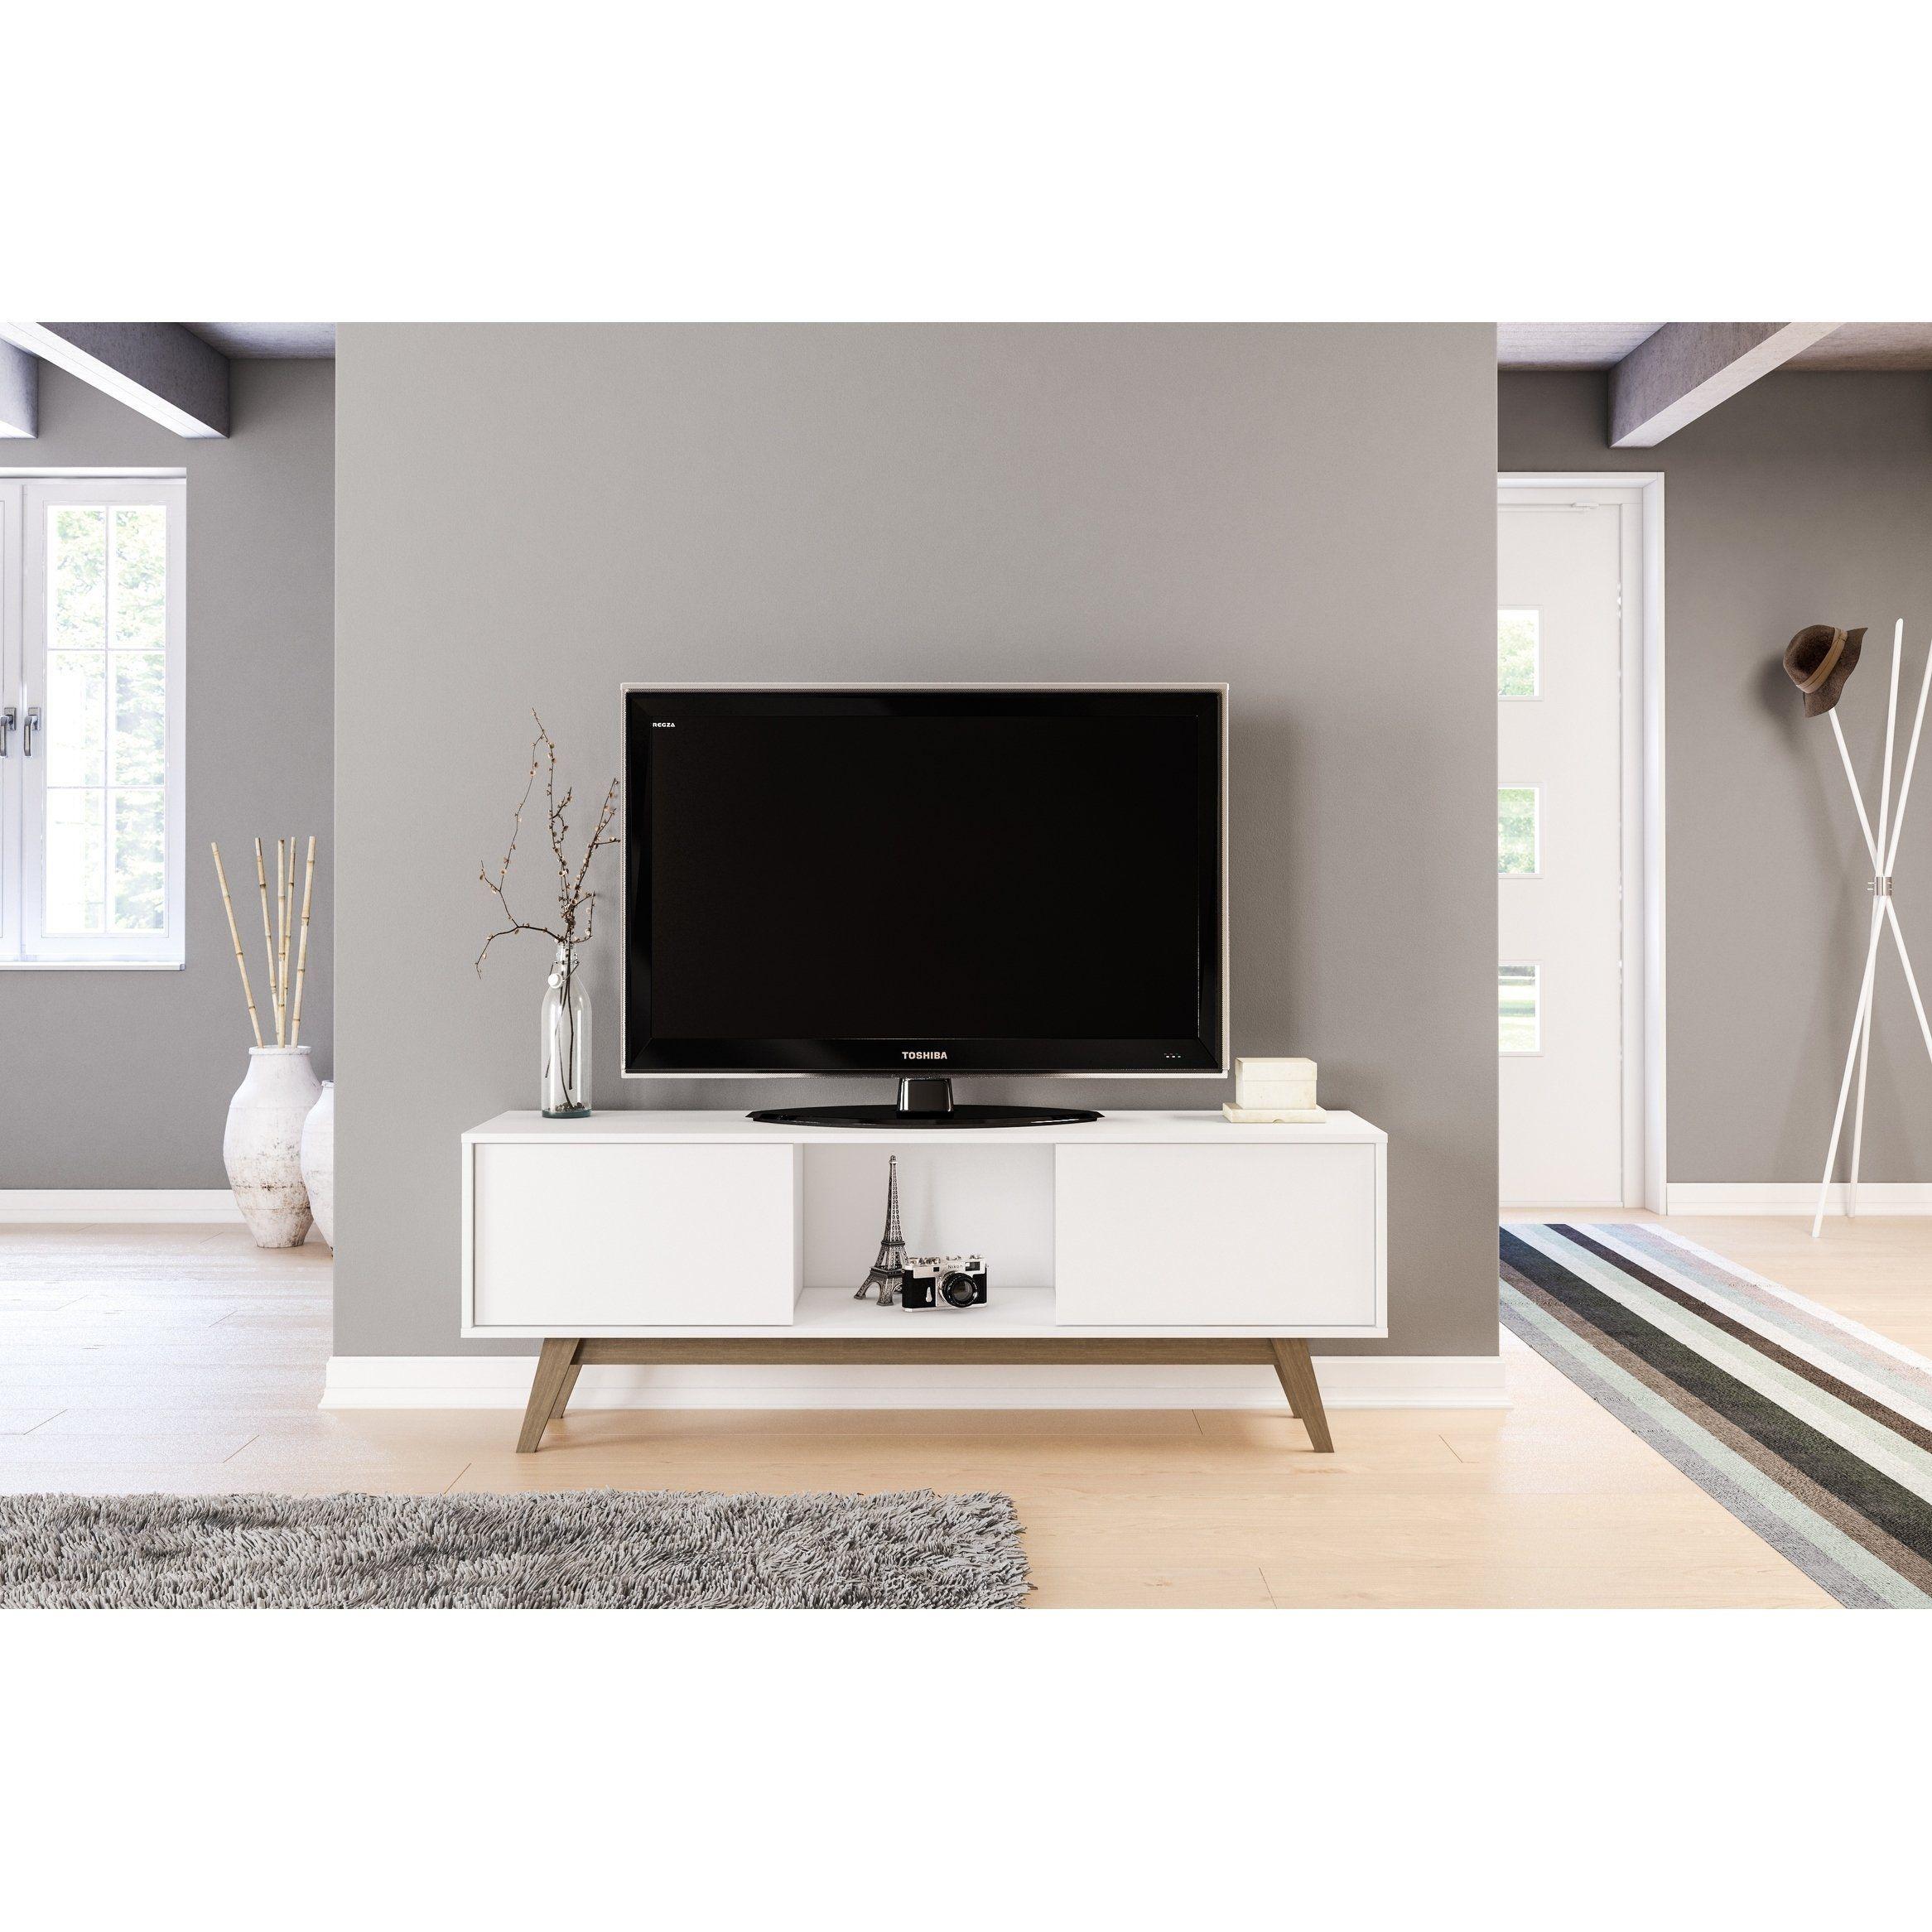 My Ikea Byas Tv Stand Lg 4k Ultra Hd Tv 3d My Tv Stand Decor Decoration Ideas Tv Stand Decor Ikea Tv Stand Ikea Byas Tv Stand